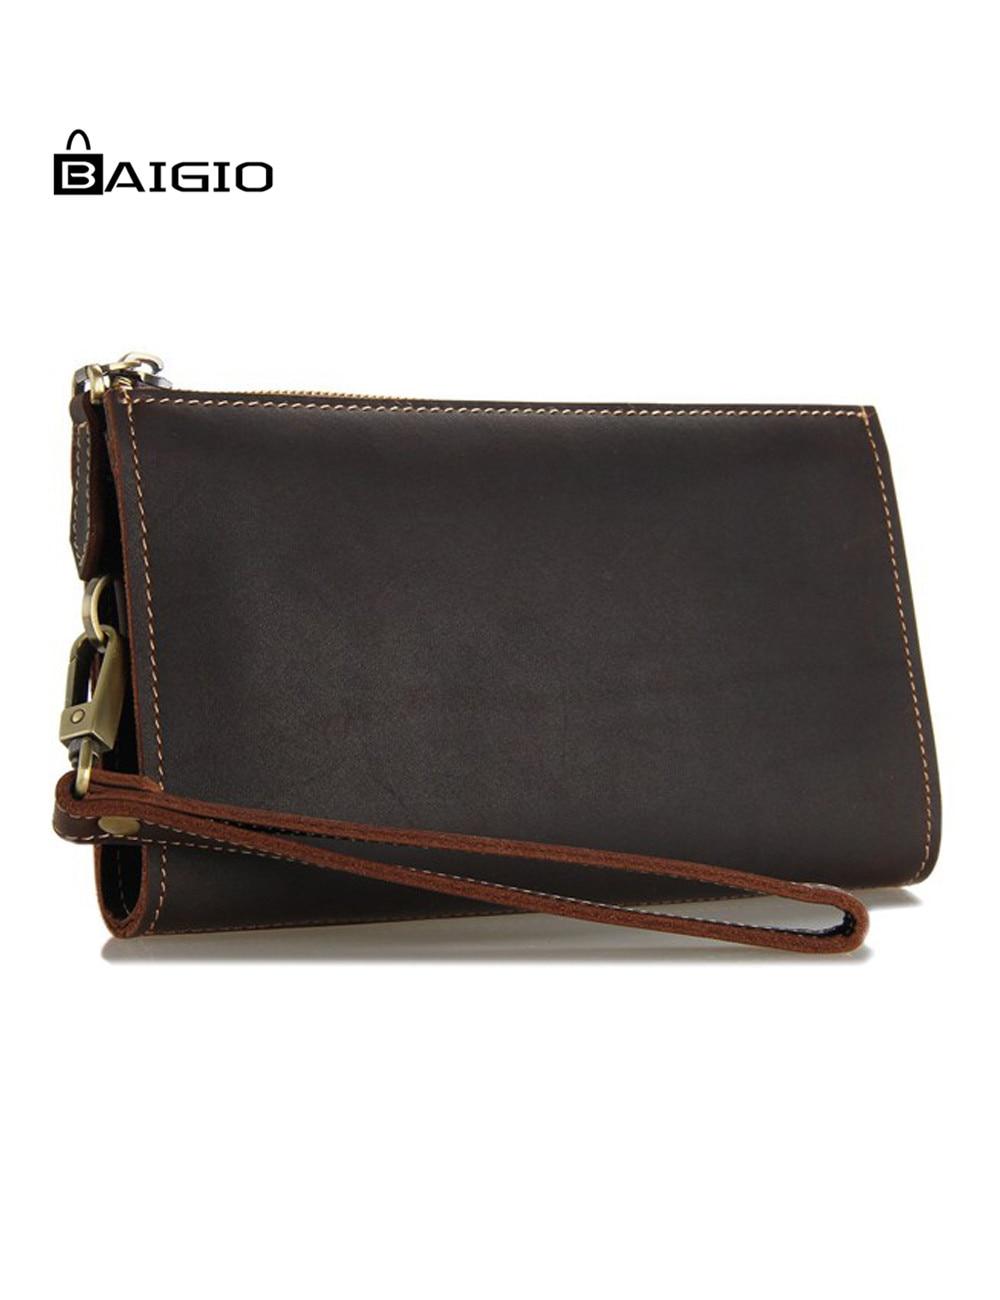 ФОТО Baigio Men's Vintage Crazy Horse Leather Long Bifold Wallet Clutch Purses Handbags Designer Leather Zipper Wave Pattern Wallet